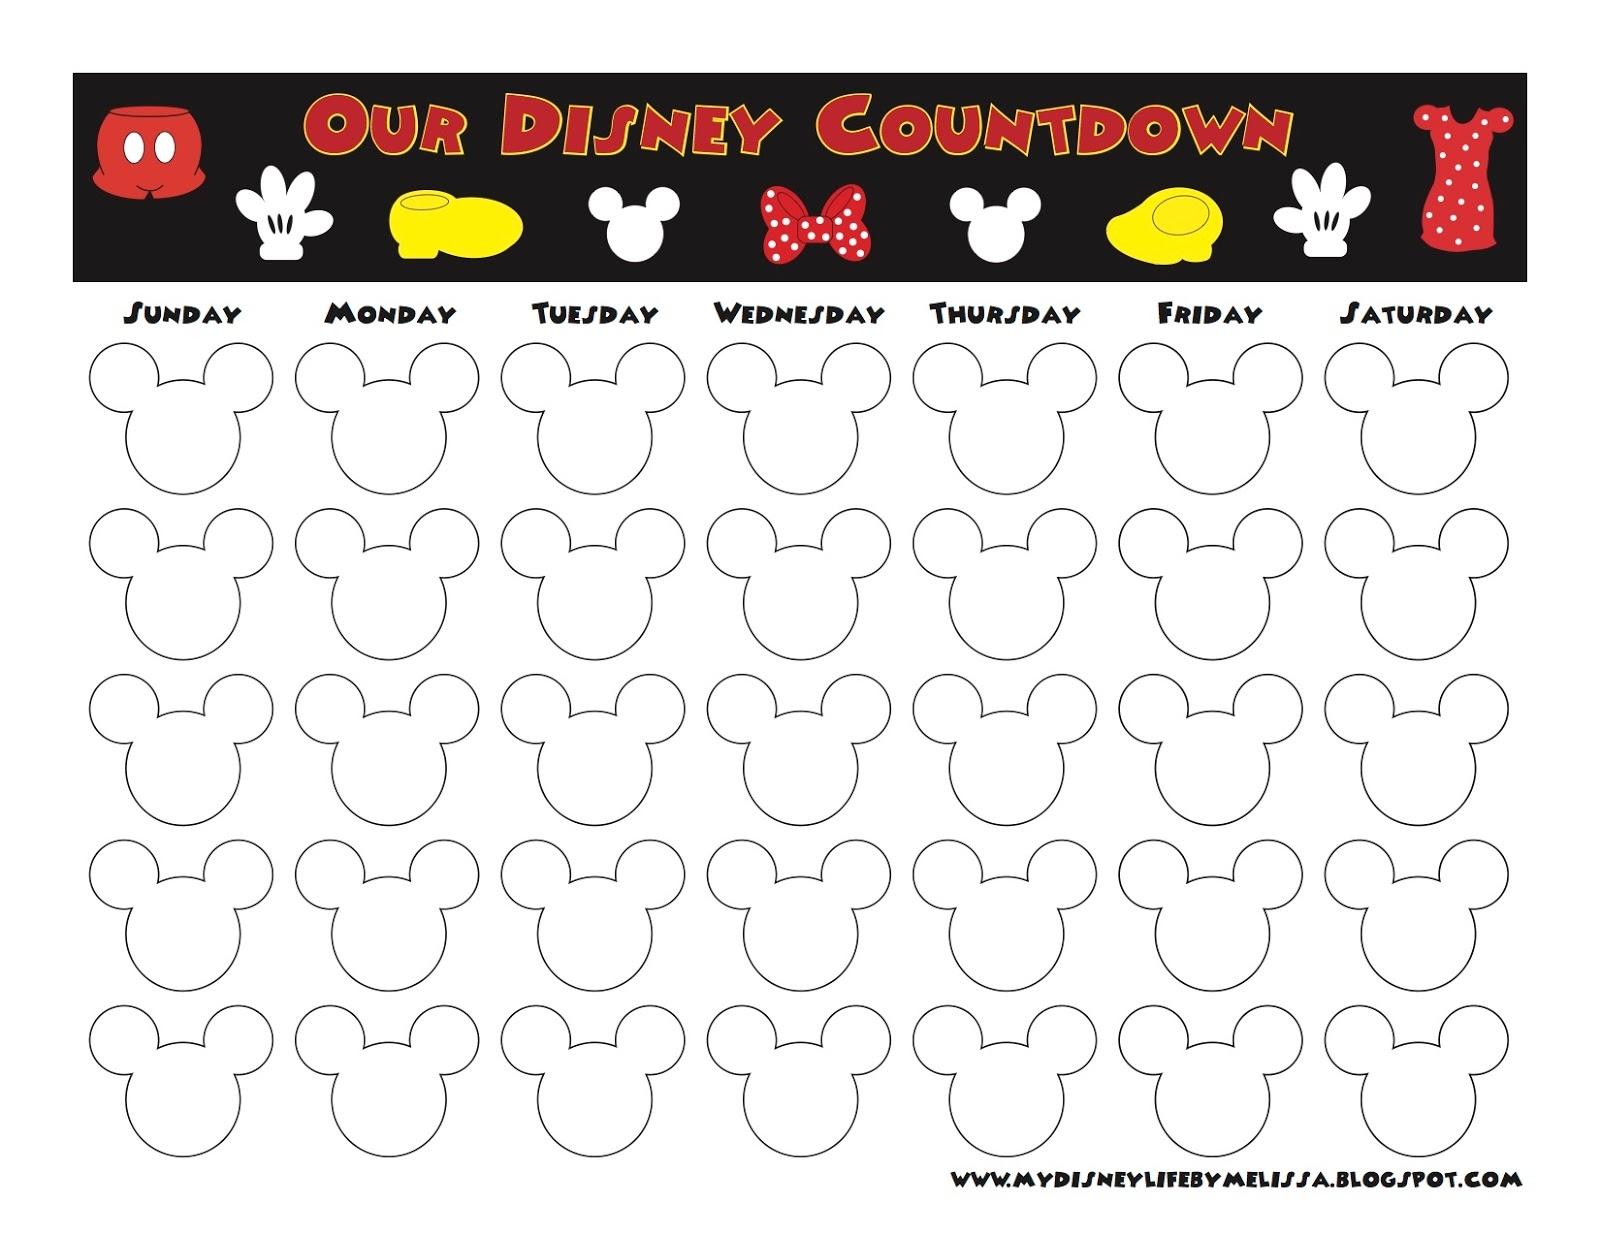 My Disney Life Countdown Calendars3abry